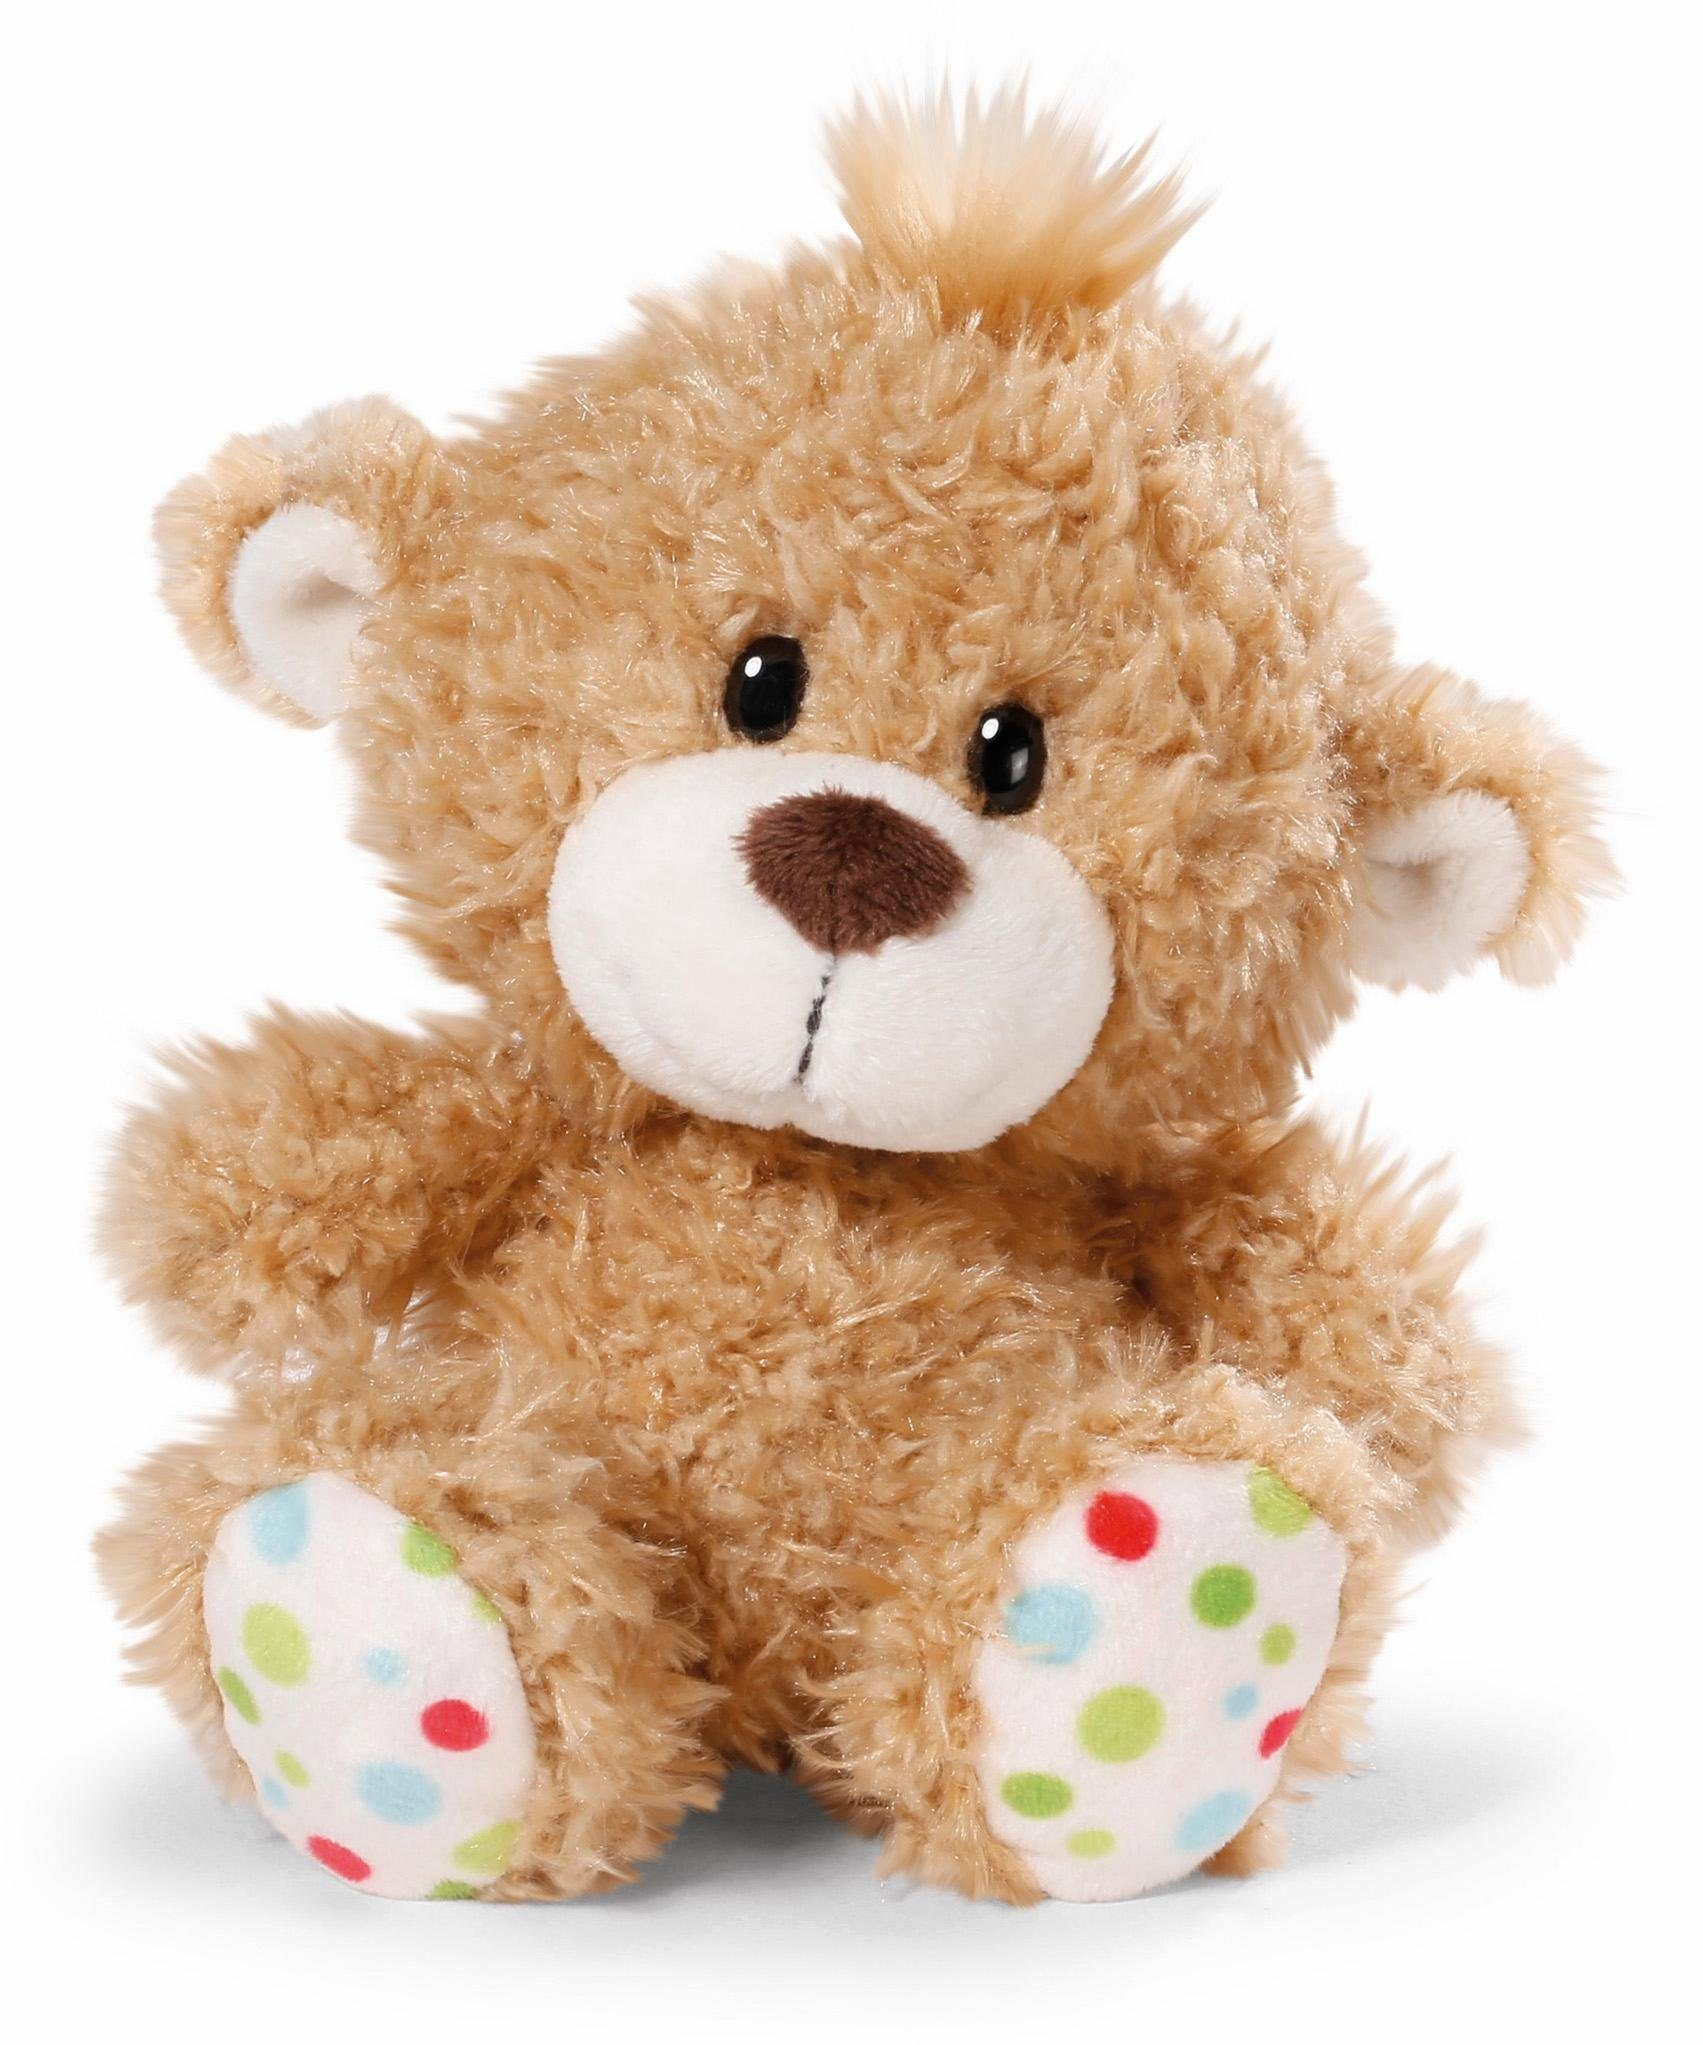 NICI Plüschtier, »Classic Bear kleiner Bruder Bär, 30 cm«